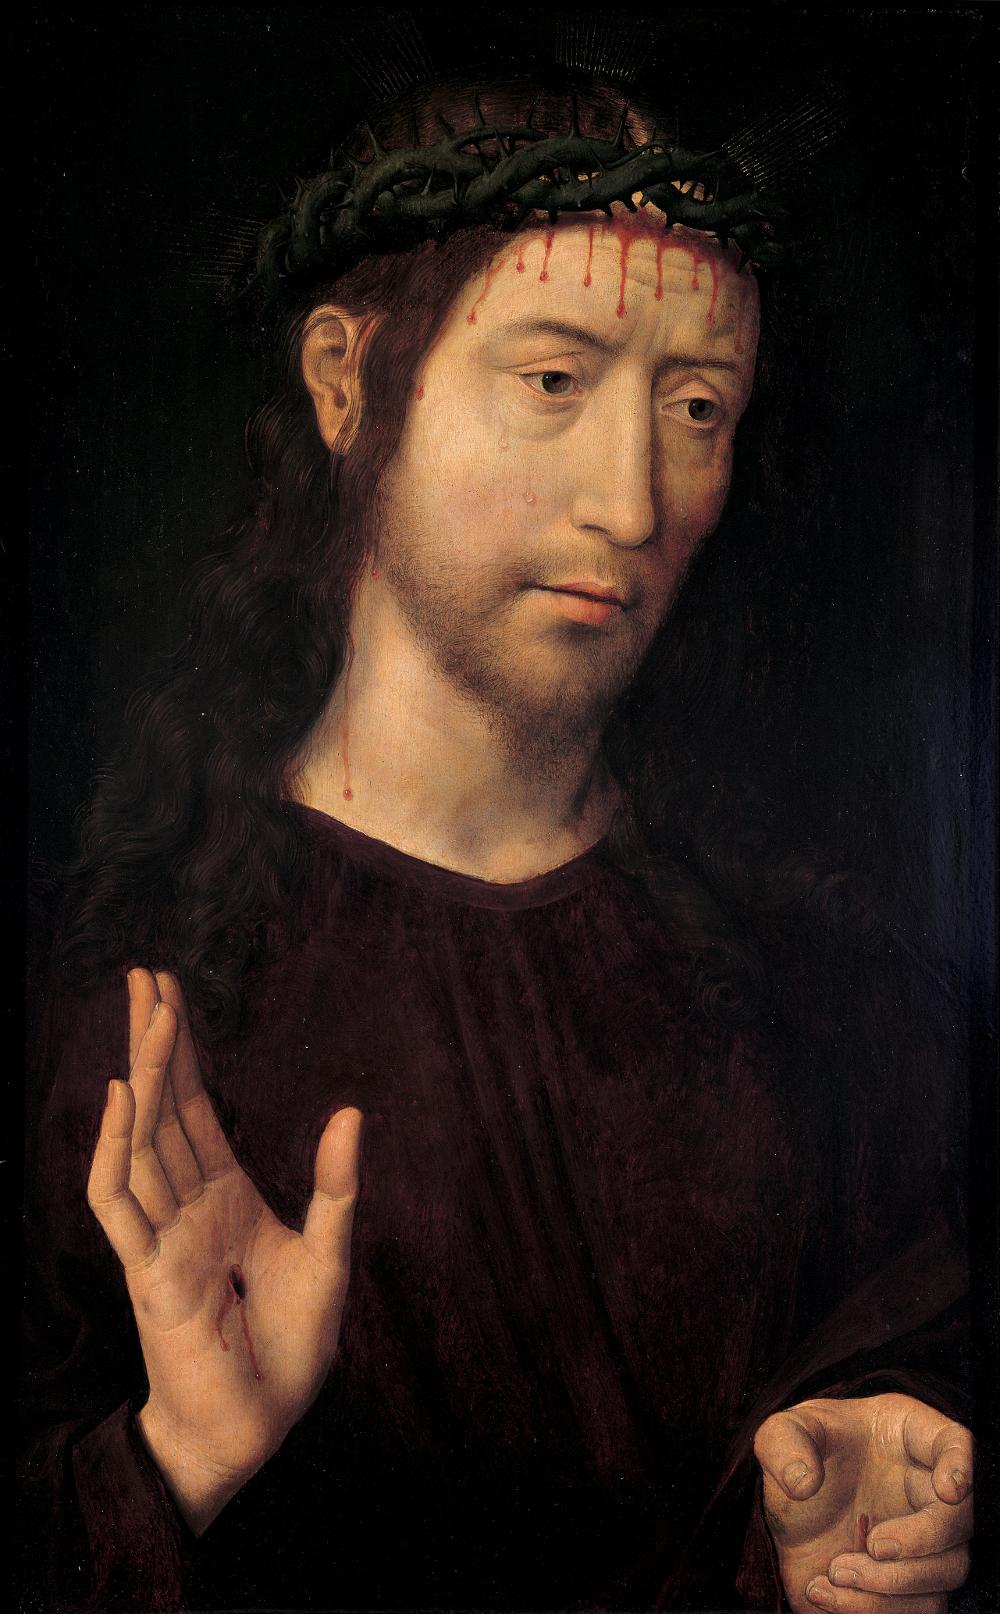 1485 Hans_memling,_cristo_benedicente,_Palazzo Bianco genova